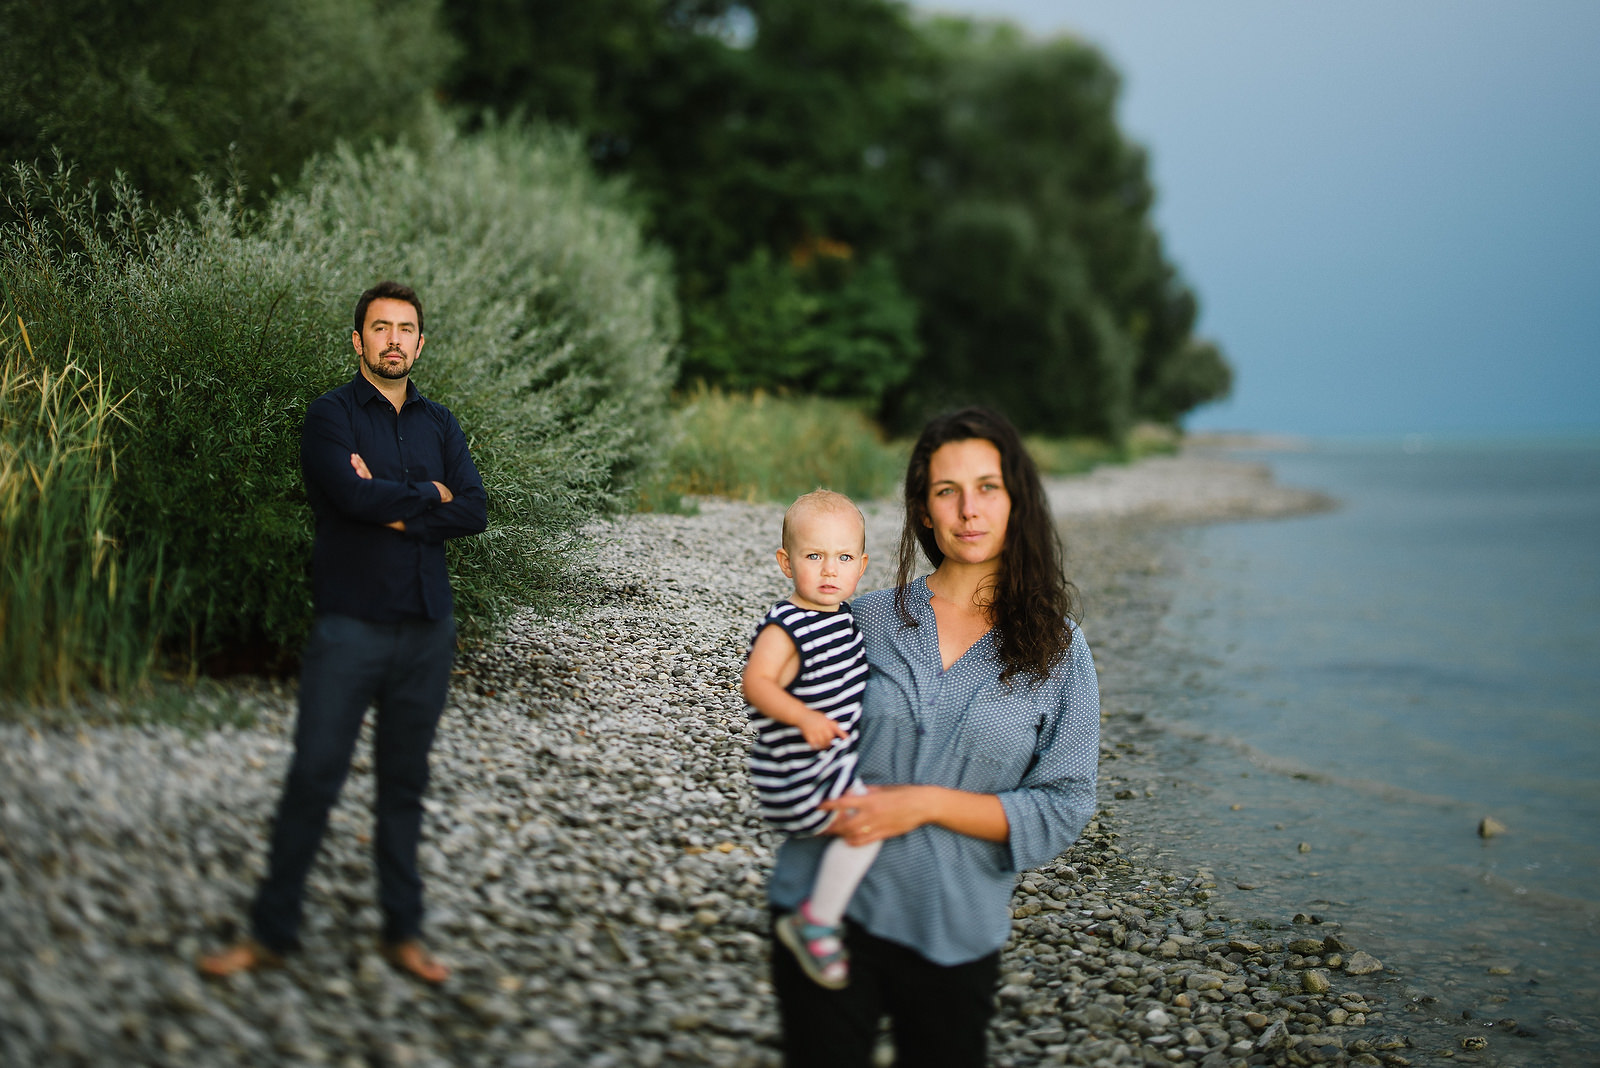 Fotograf Konstanz - Familienbilder Familien Musiker Baby Paar Shooting Konstanz EFP 05 - Family-Shooting at Lake Constance  - 1 -